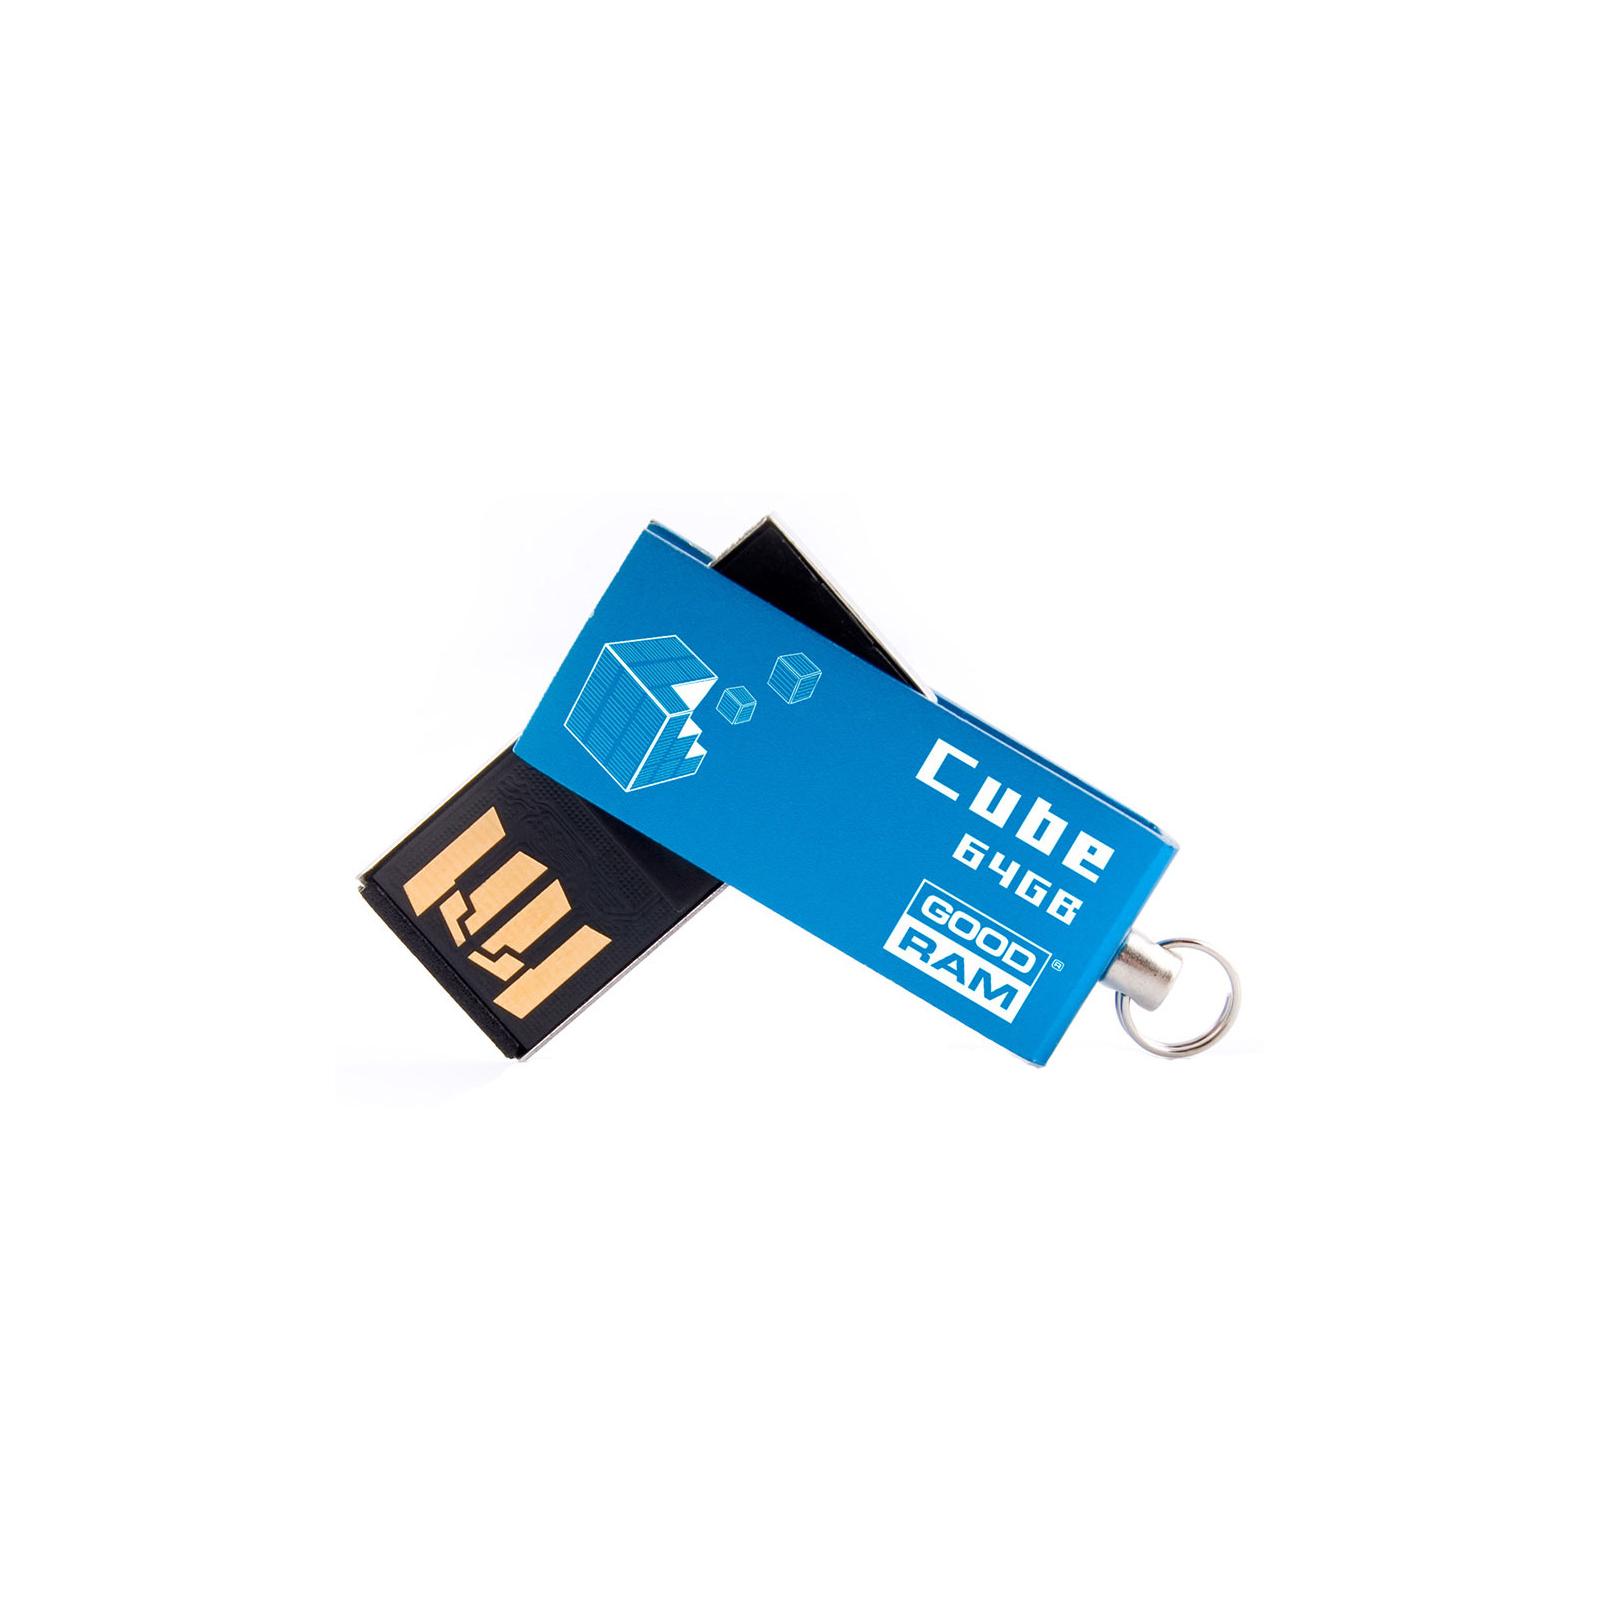 USB флеш накопитель Goodram 64GB UCU2 Cube Black USB 2.0 (UCU2-0640K0R11)